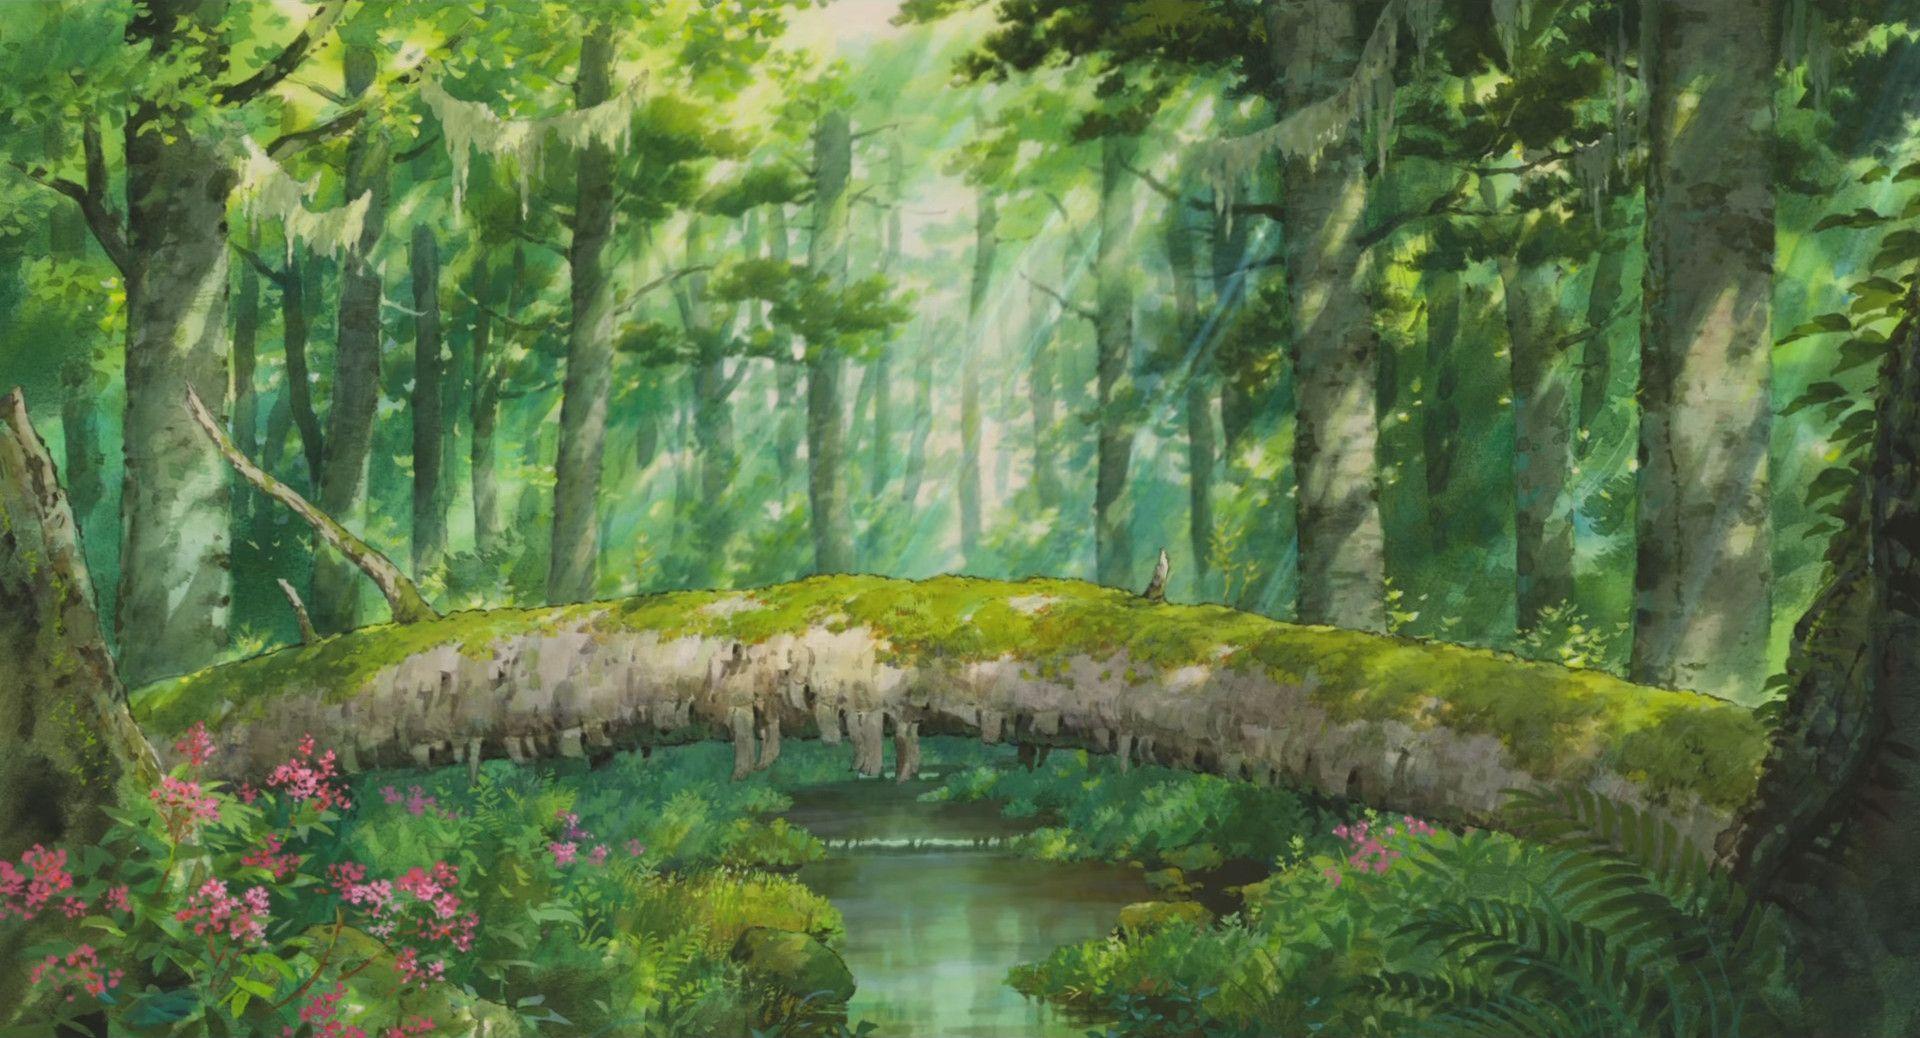 Studio Ghibli Scenery Wallpapers - Top Free Studio Ghibli ...